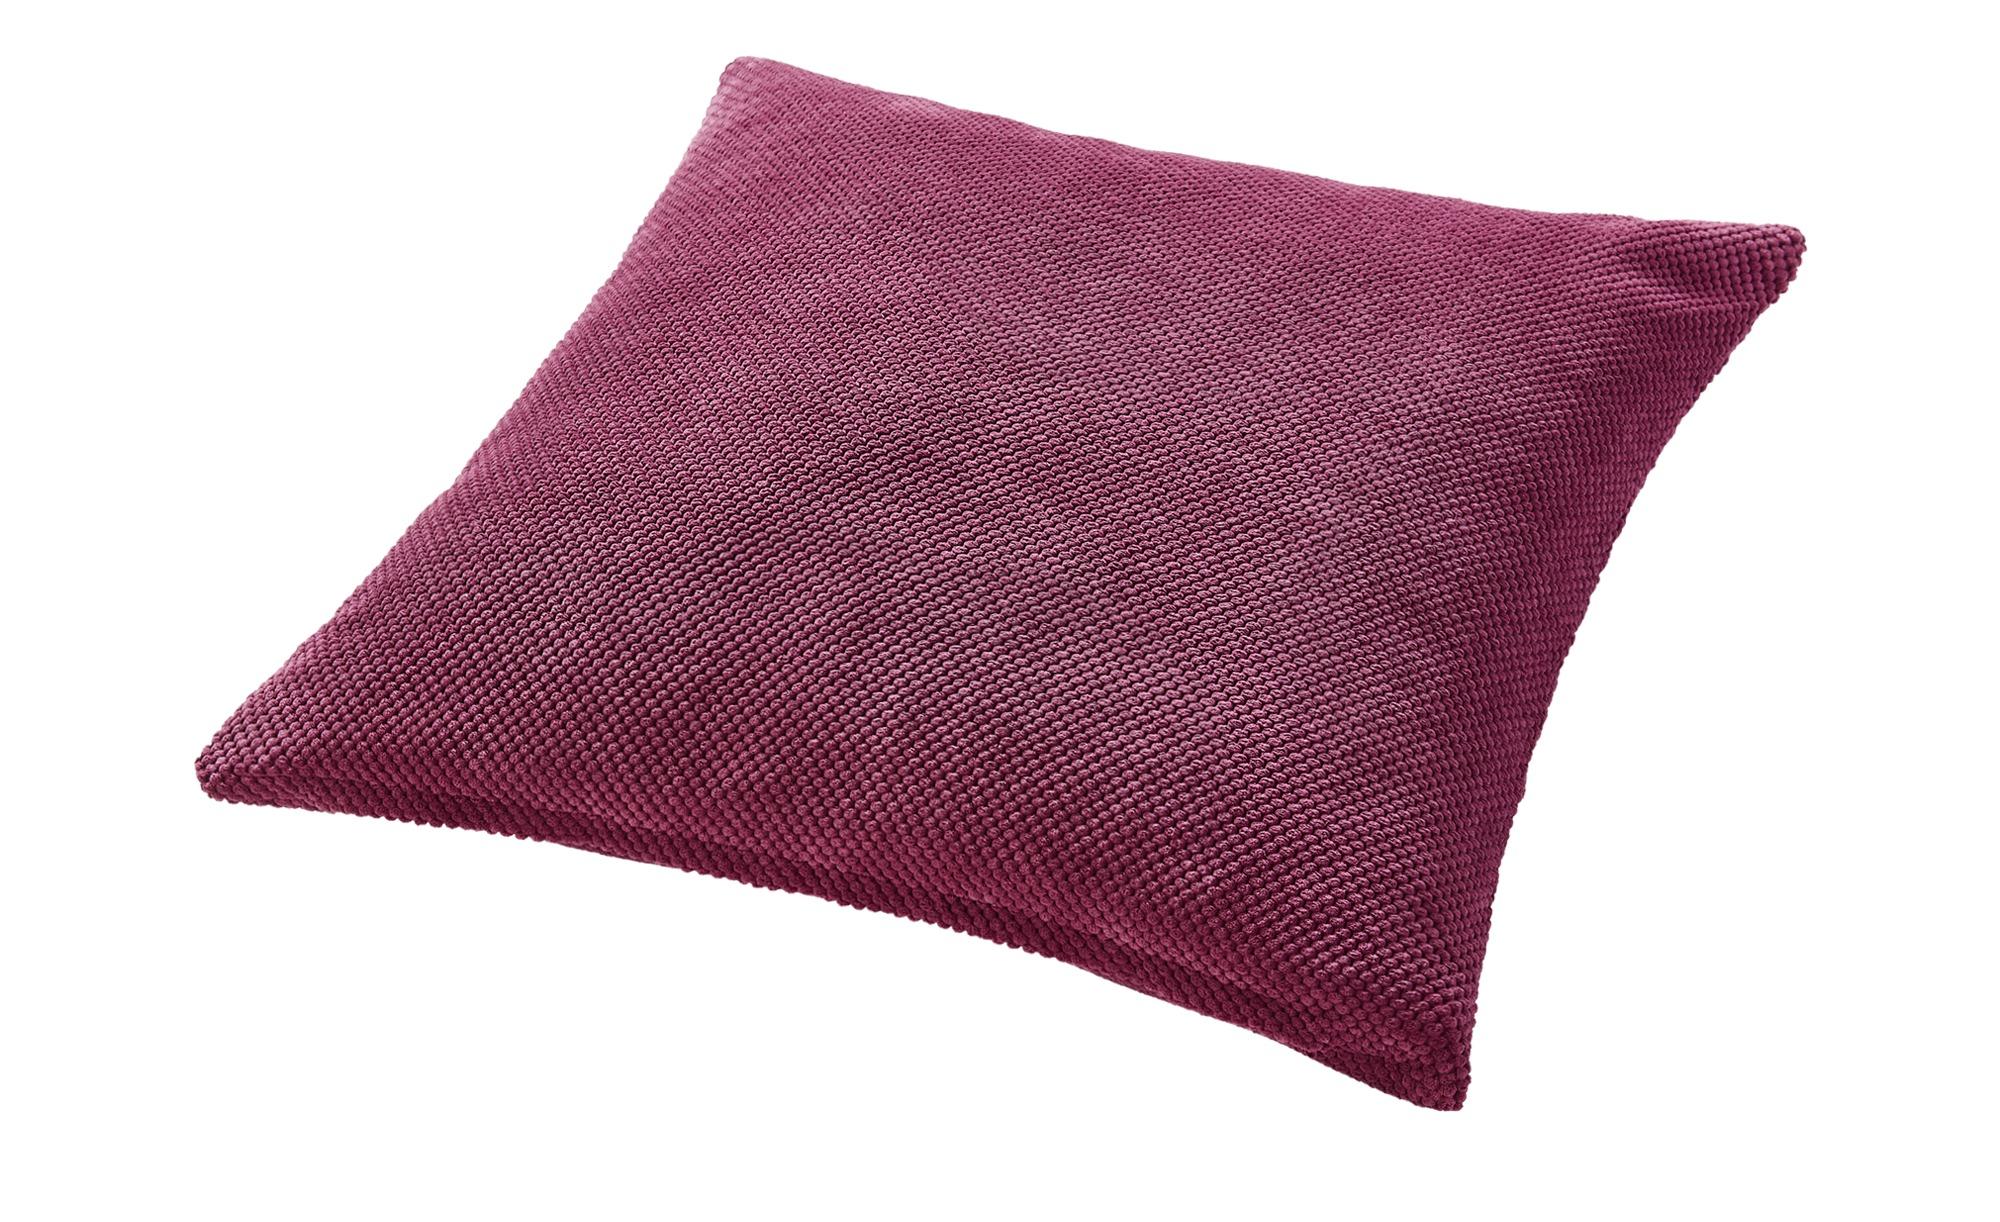 HOME STORY Bodenkissen  Lisa ¦ lila/violett ¦ Polyester ¦ Maße (cm): B: 70 Heimtextilien > Kissen > Bodenkissen - Höffner